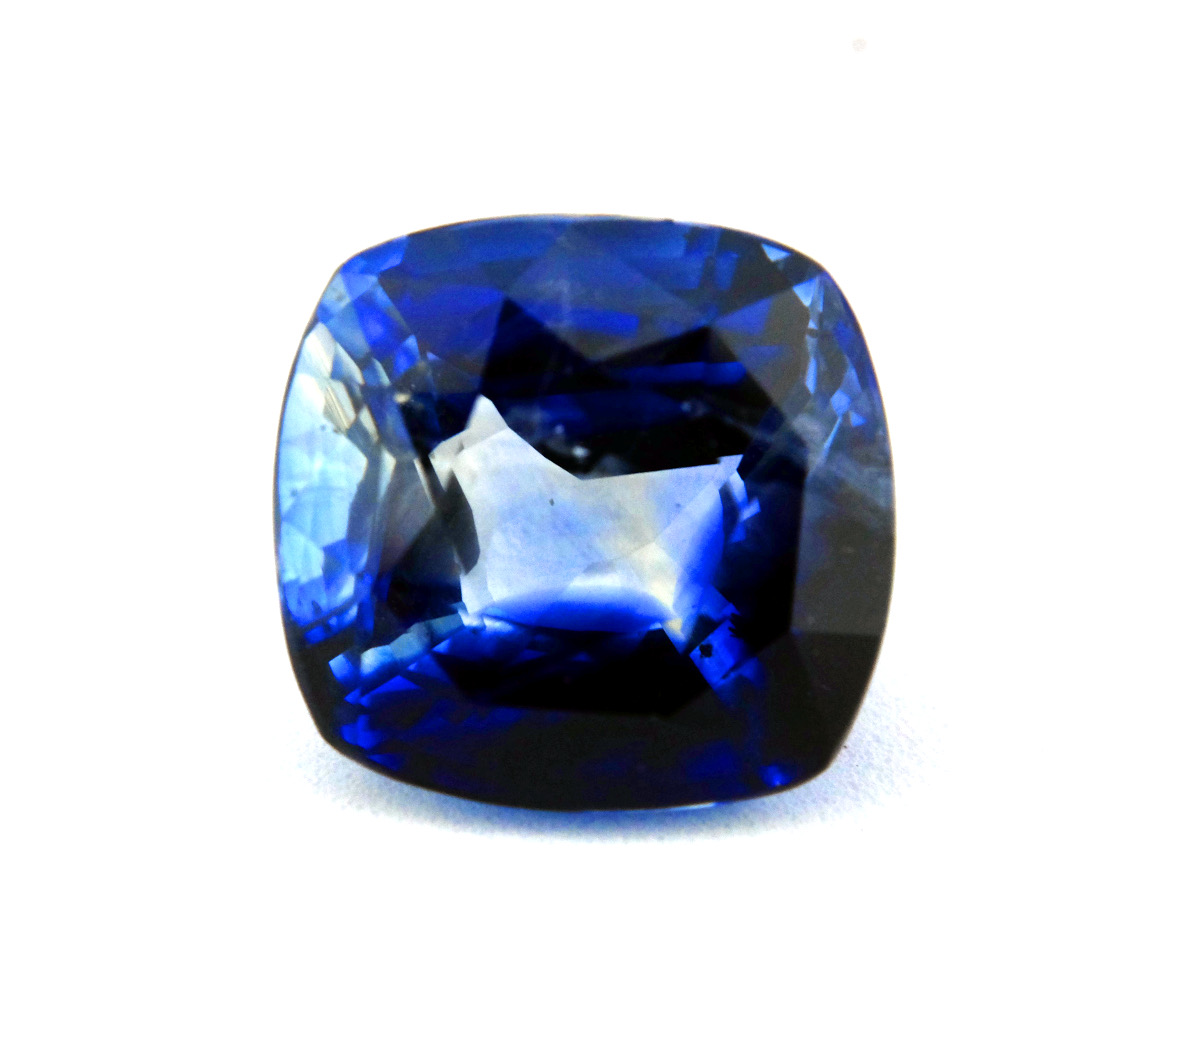 Kashmir Blue Sapphire Unheated